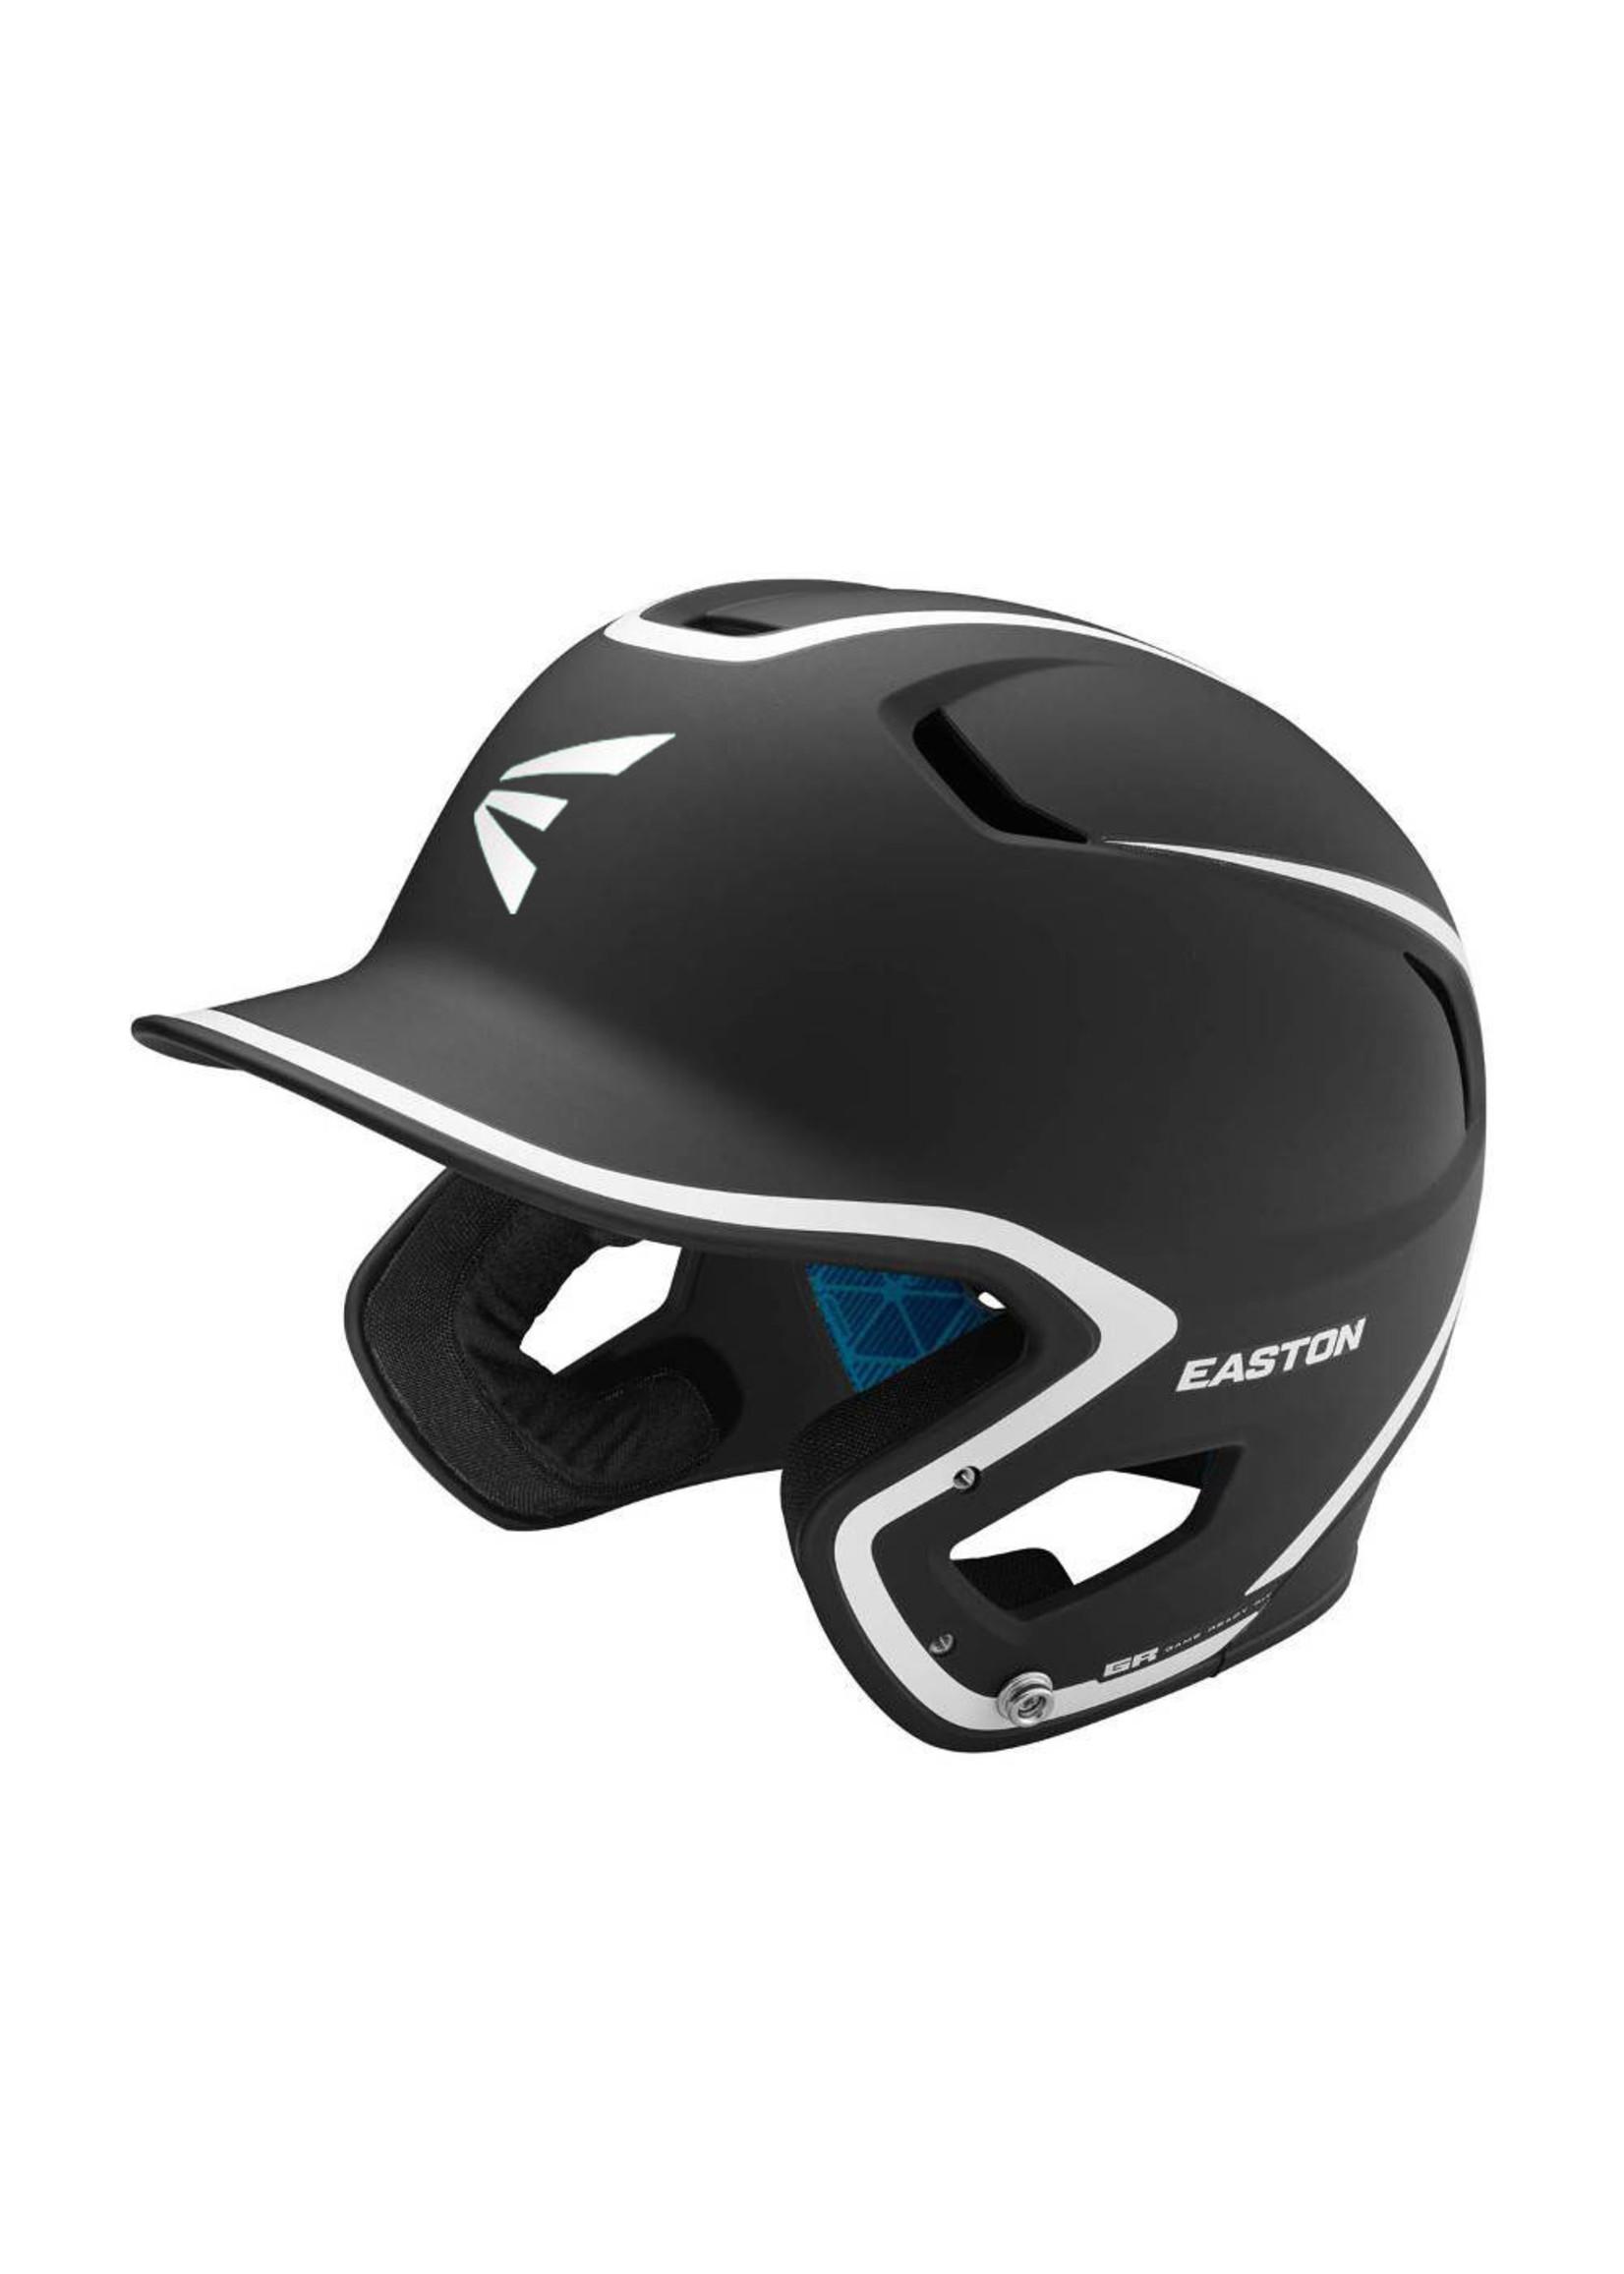 Easton Baseball (Canada) EASTON Z5 2.0 SR 2-COLORS HELMET